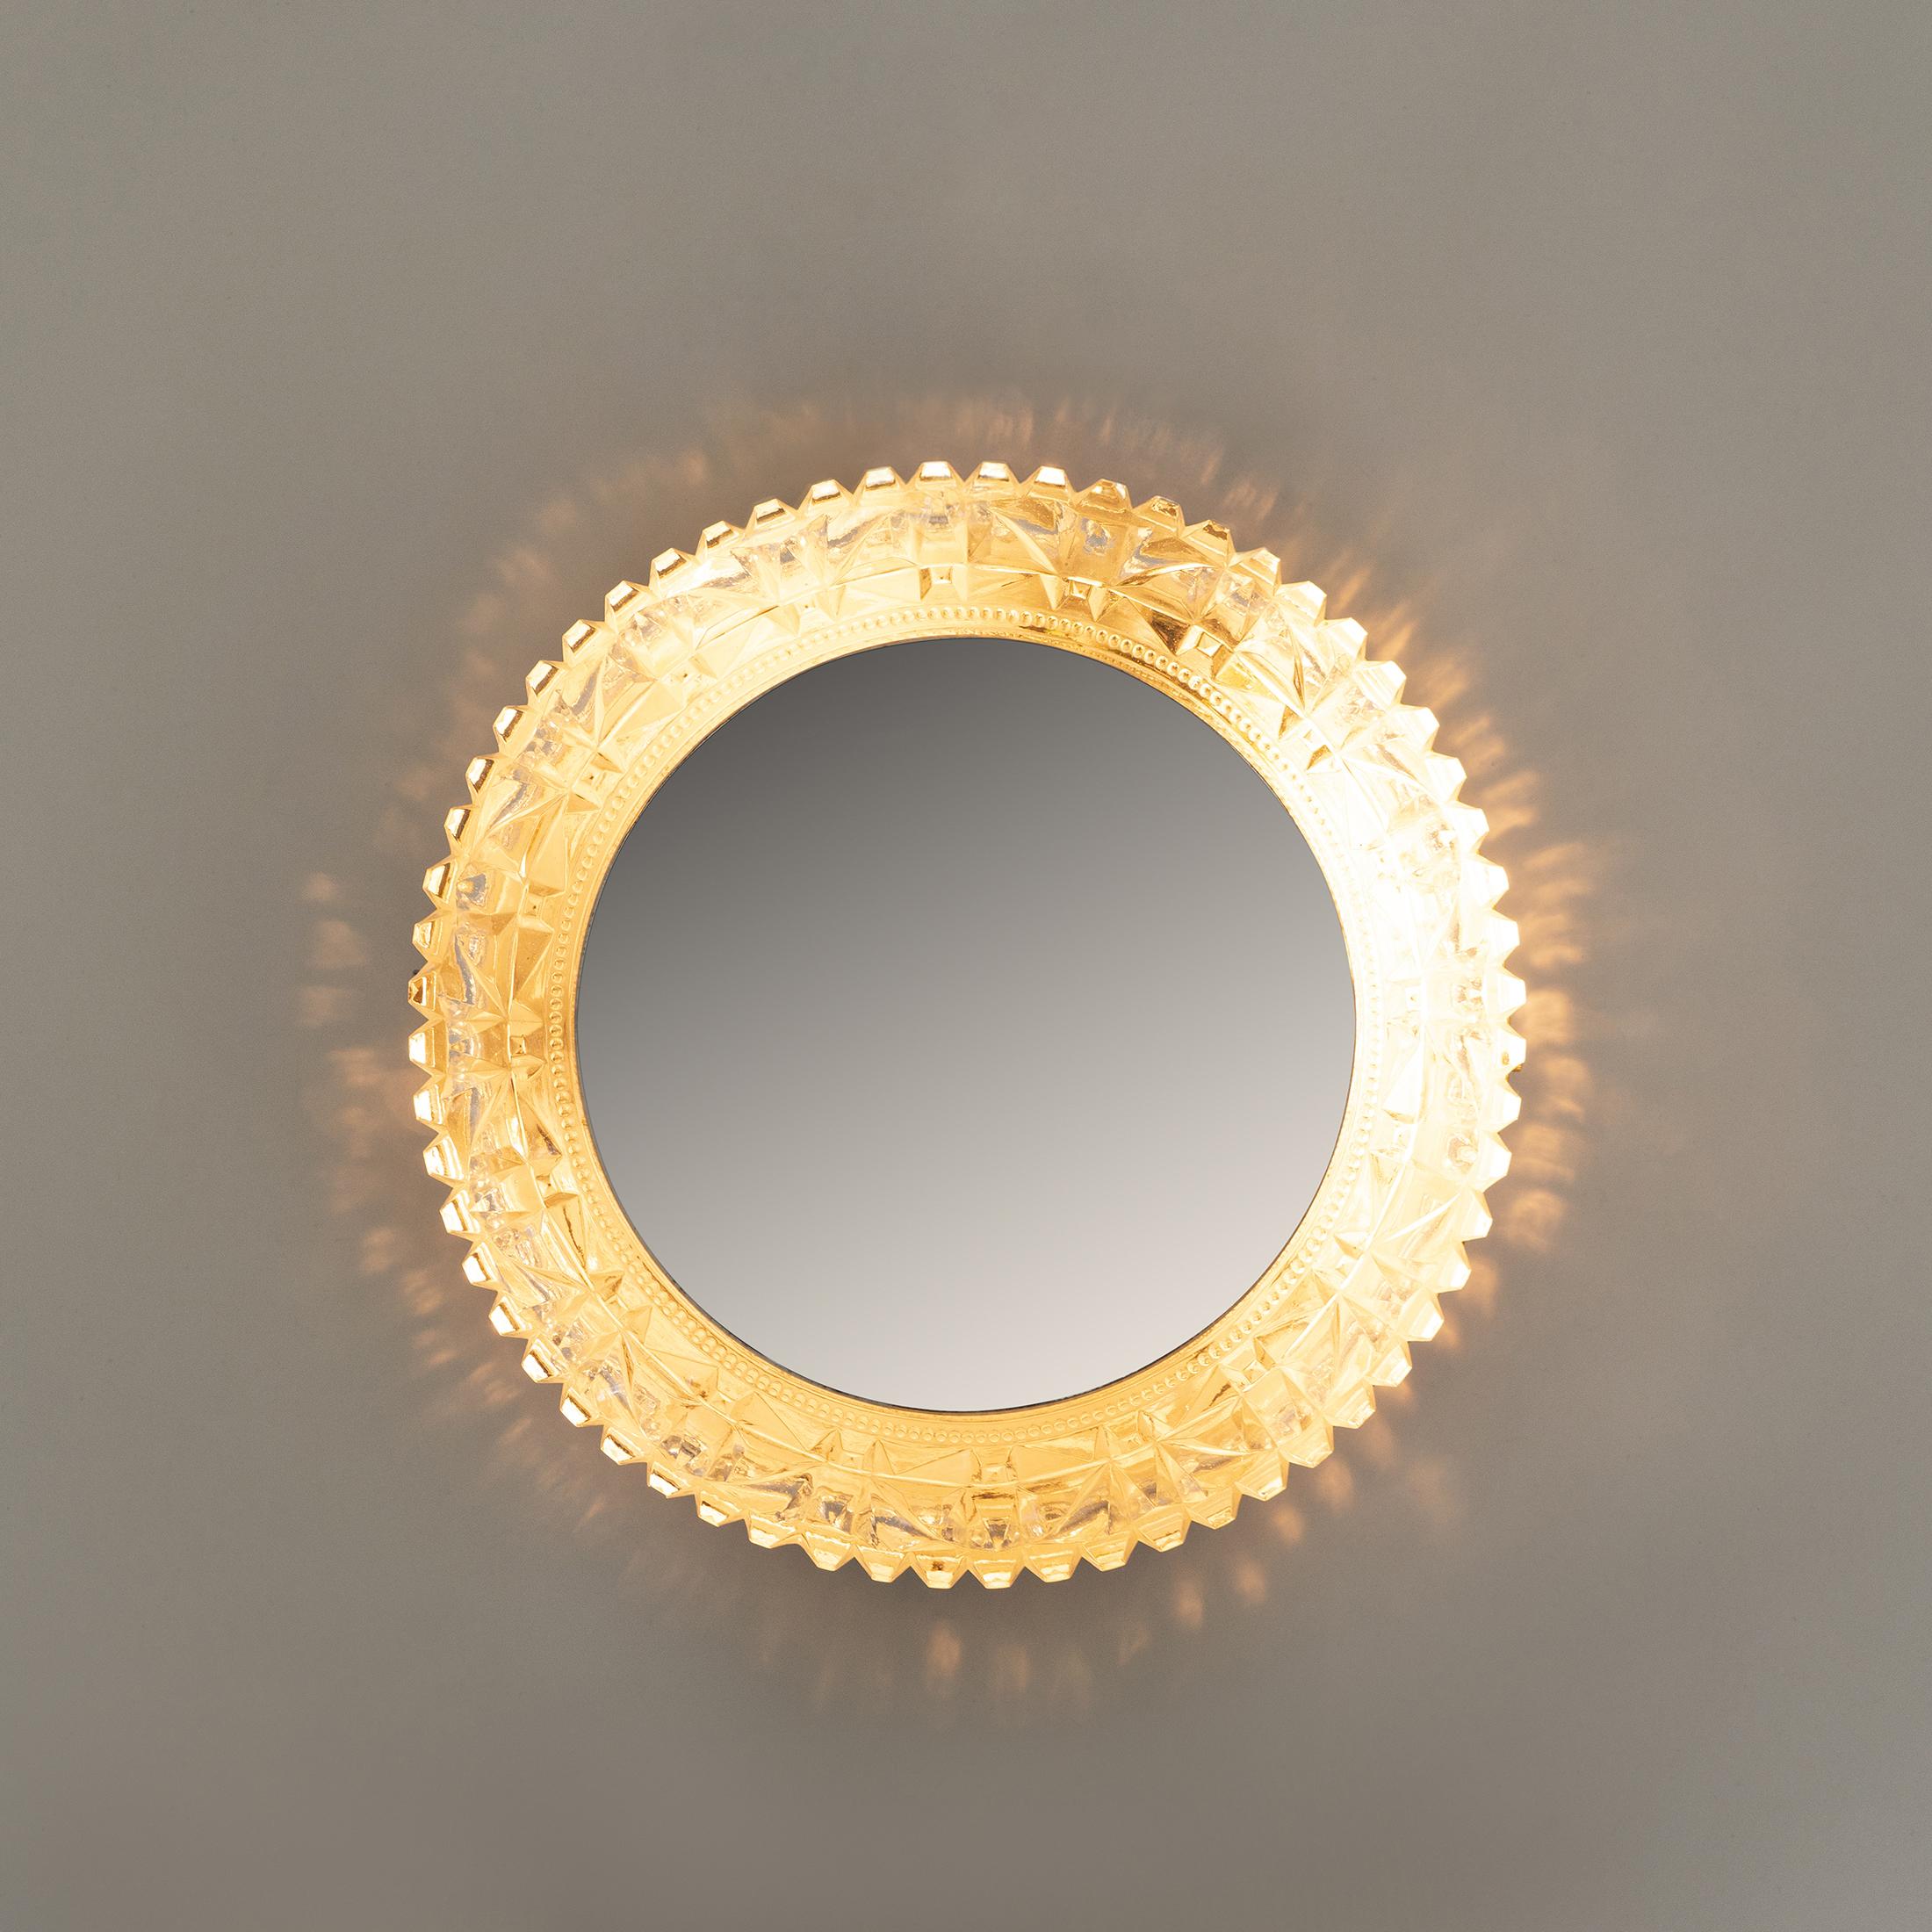 Circular Backlit Mirror 0393